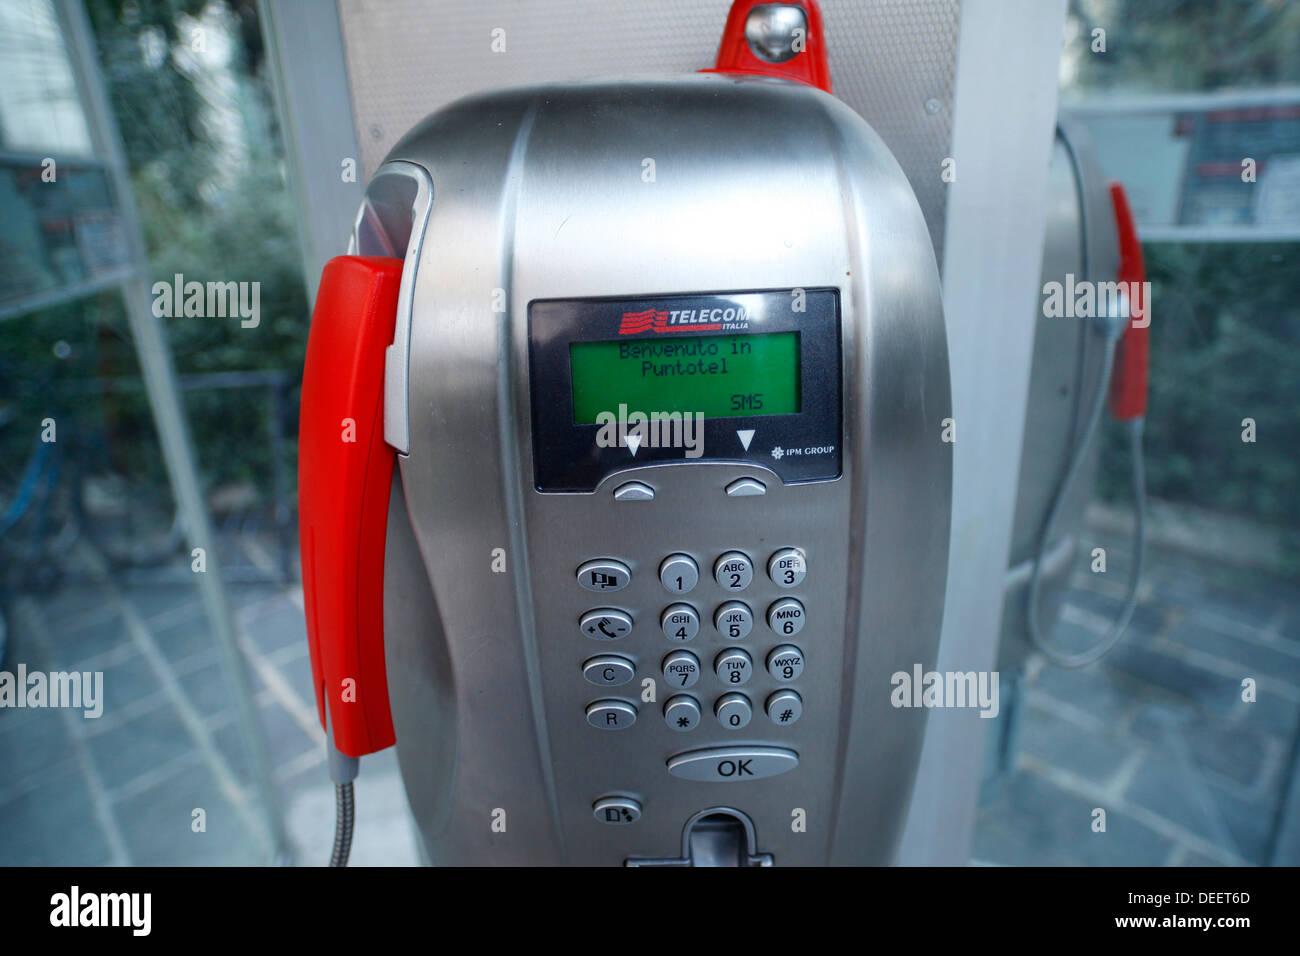 Telecom Italia payphone, Italy. - Stock Image